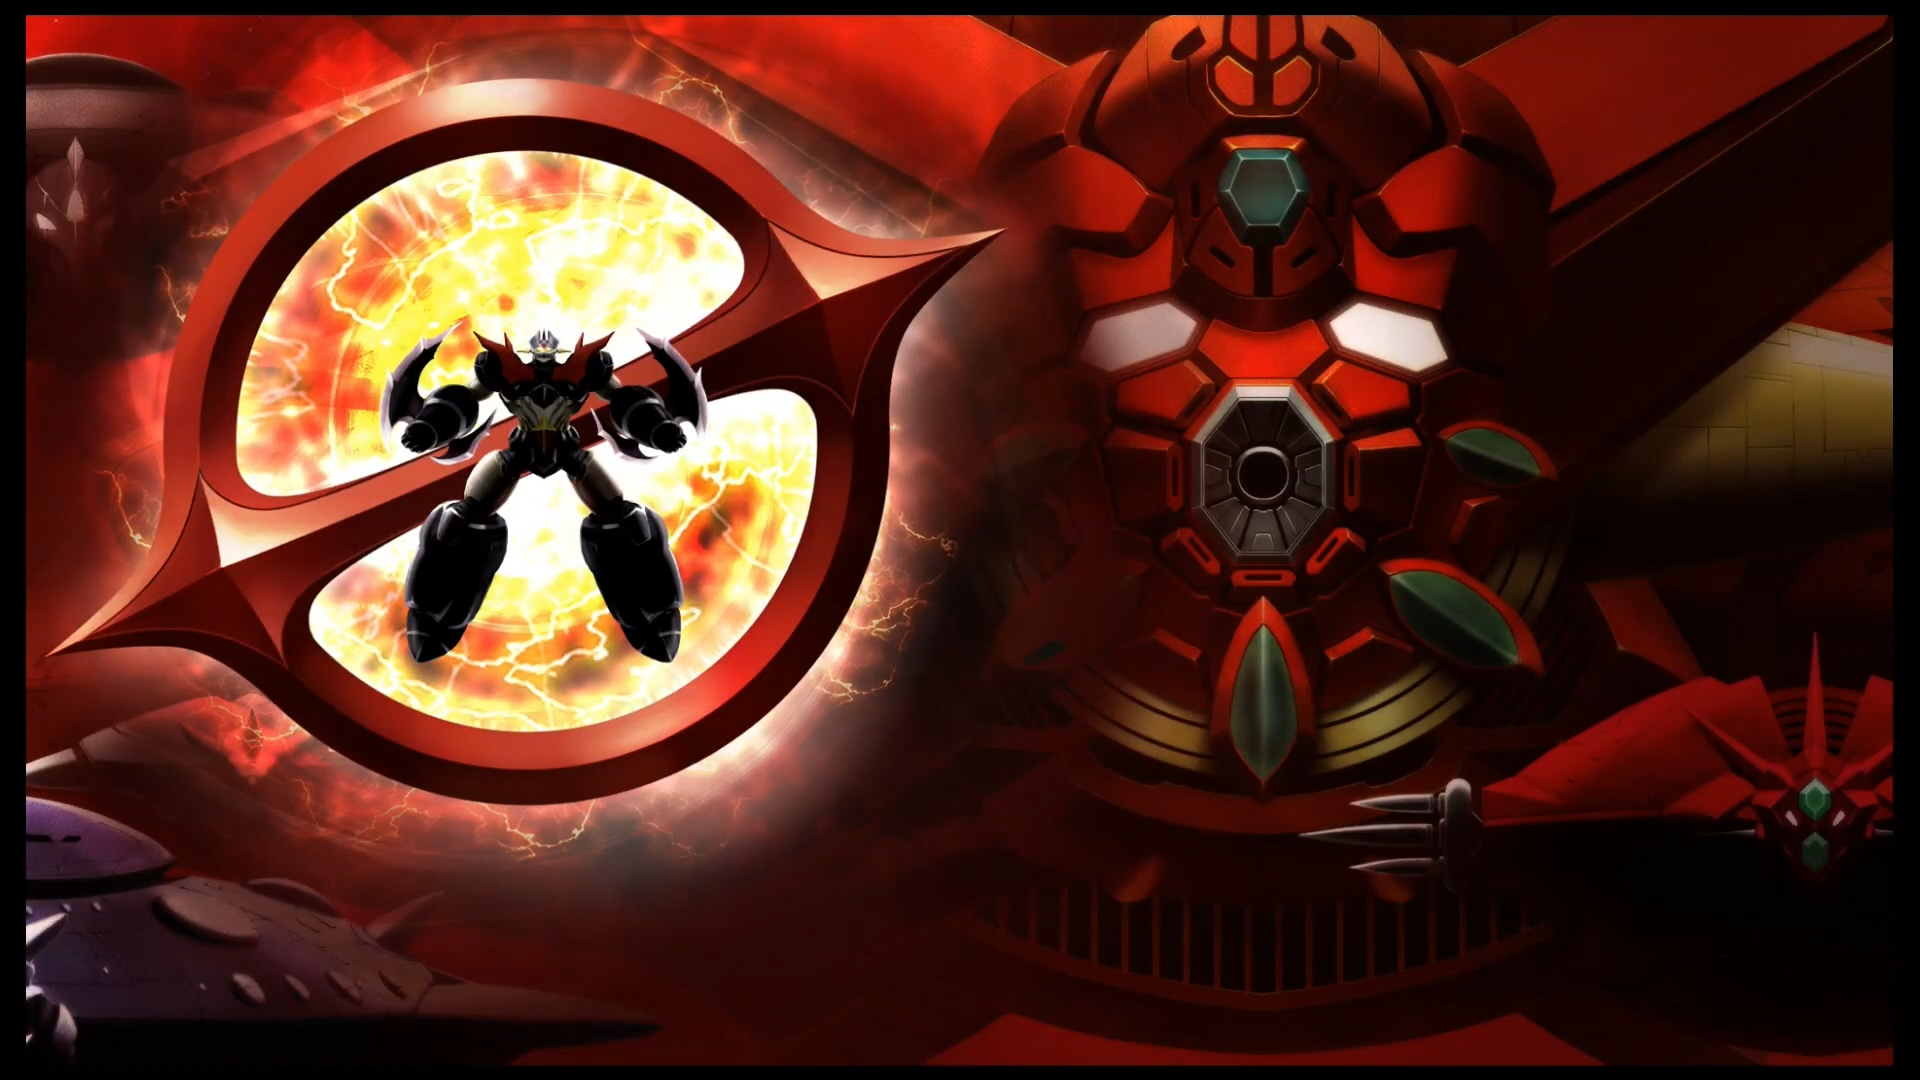 Mazinger Zero confronting the Emperor of Darkness